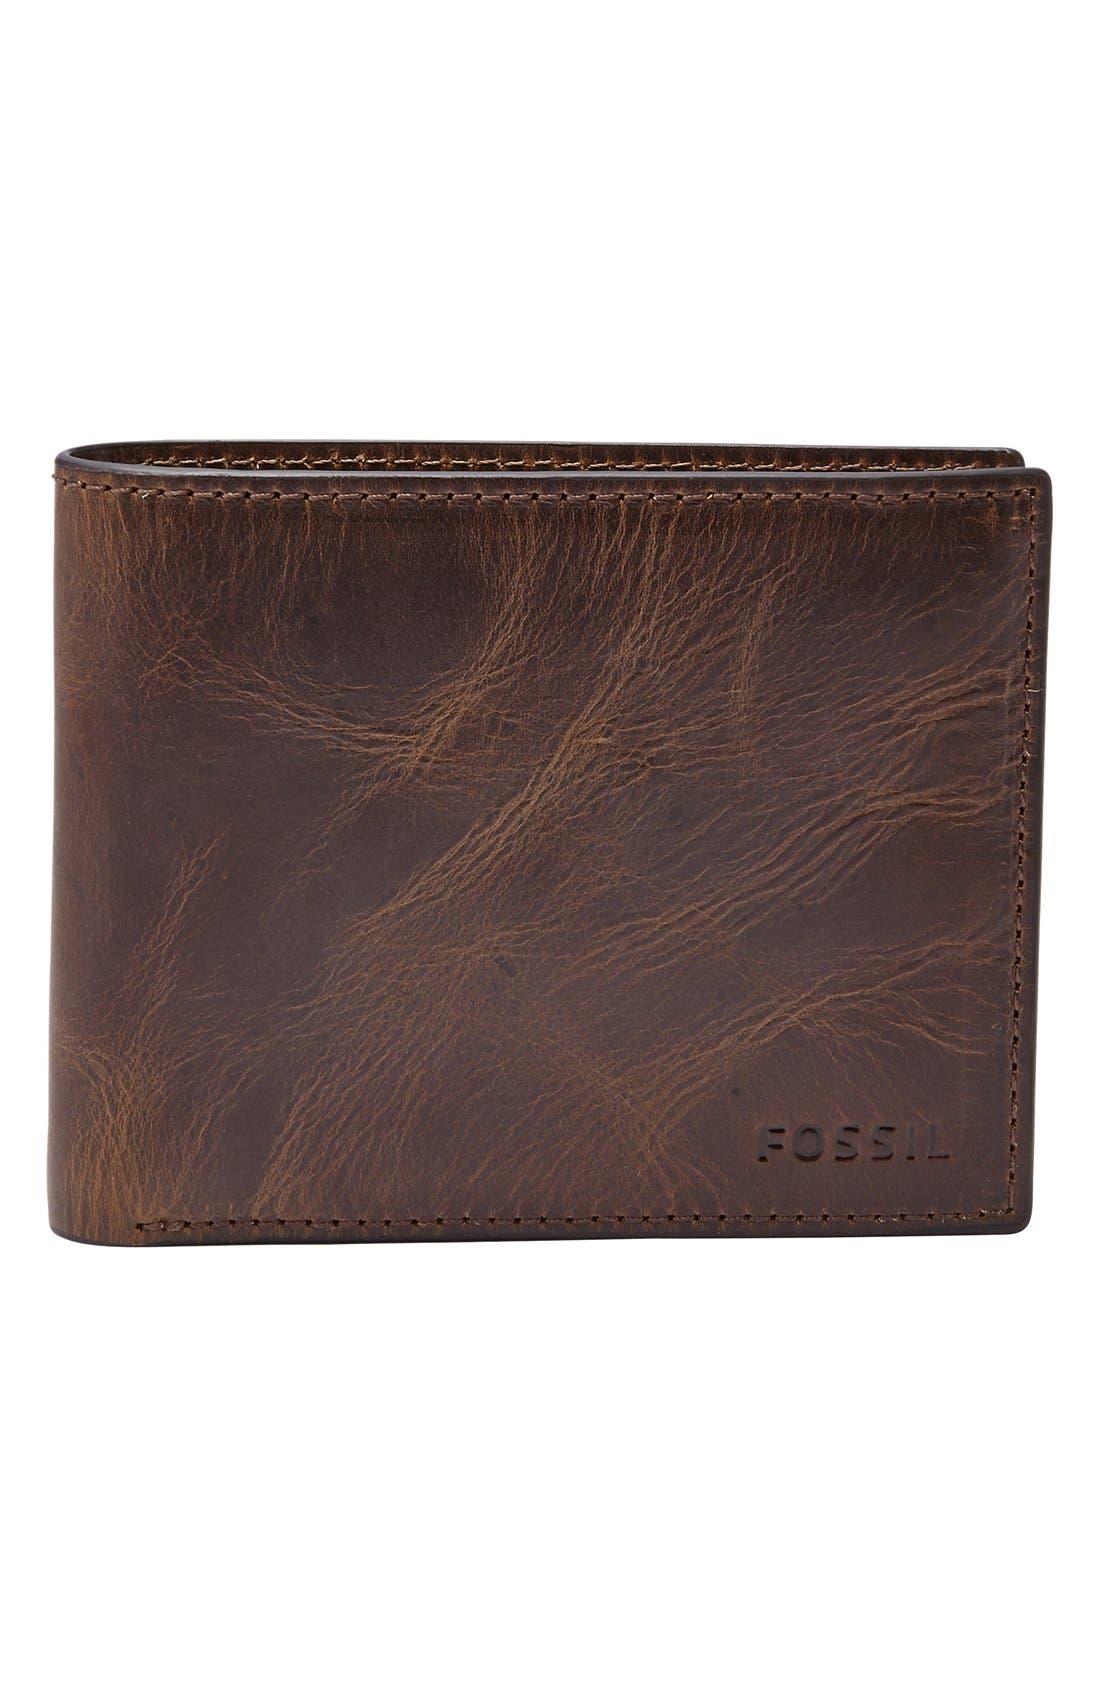 'Derrick' RFID Leather Bifold Wallet, Main, color, DARK BROWN